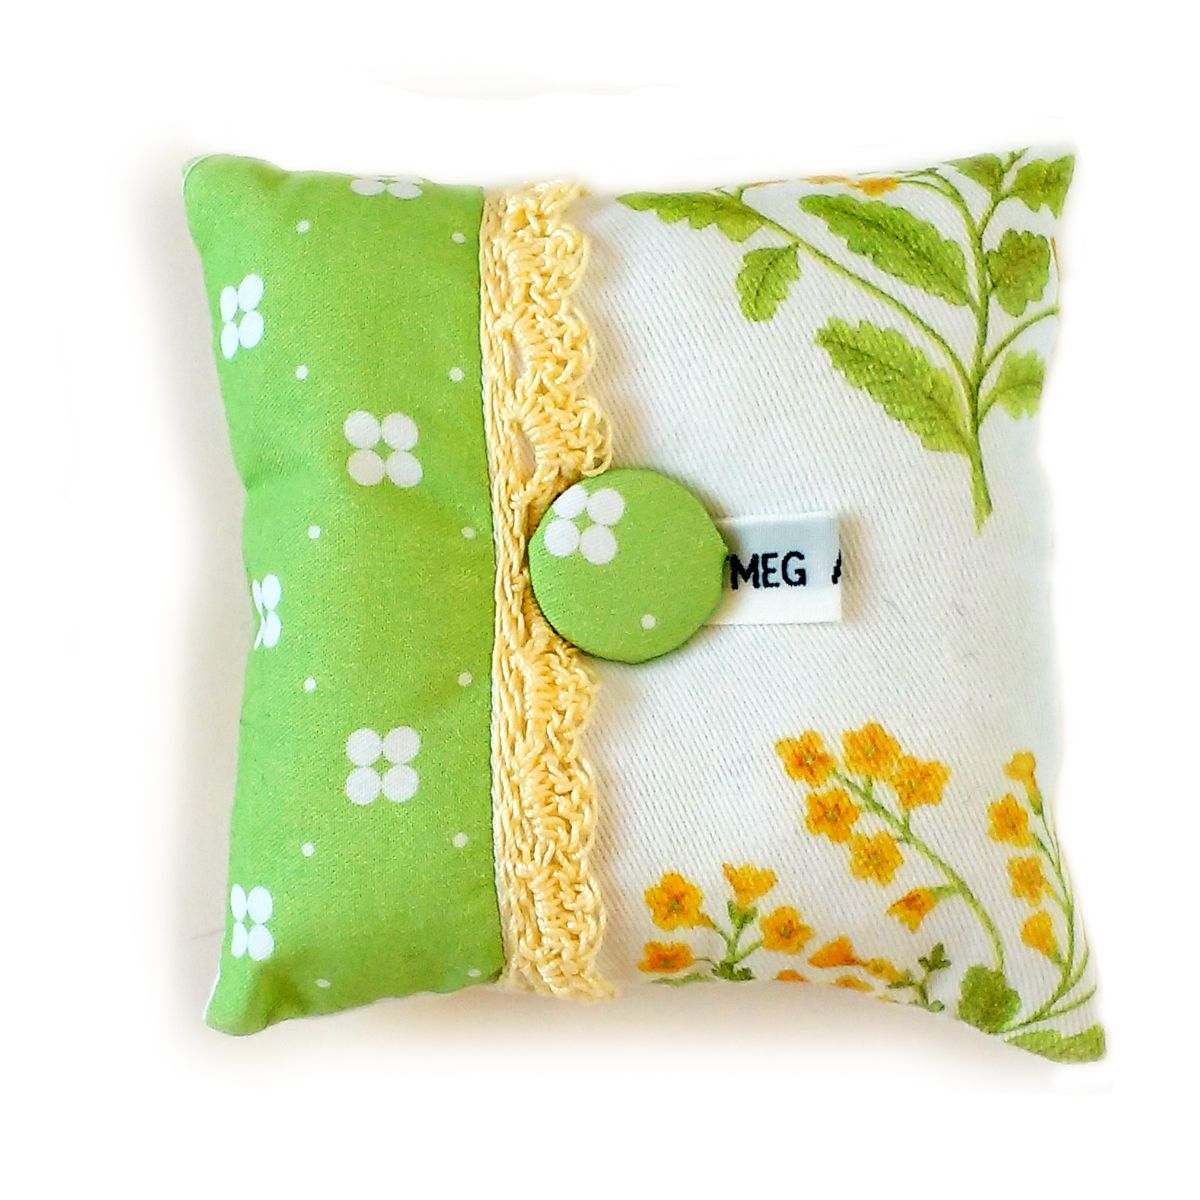 Pin cushion in cowslip design fabric